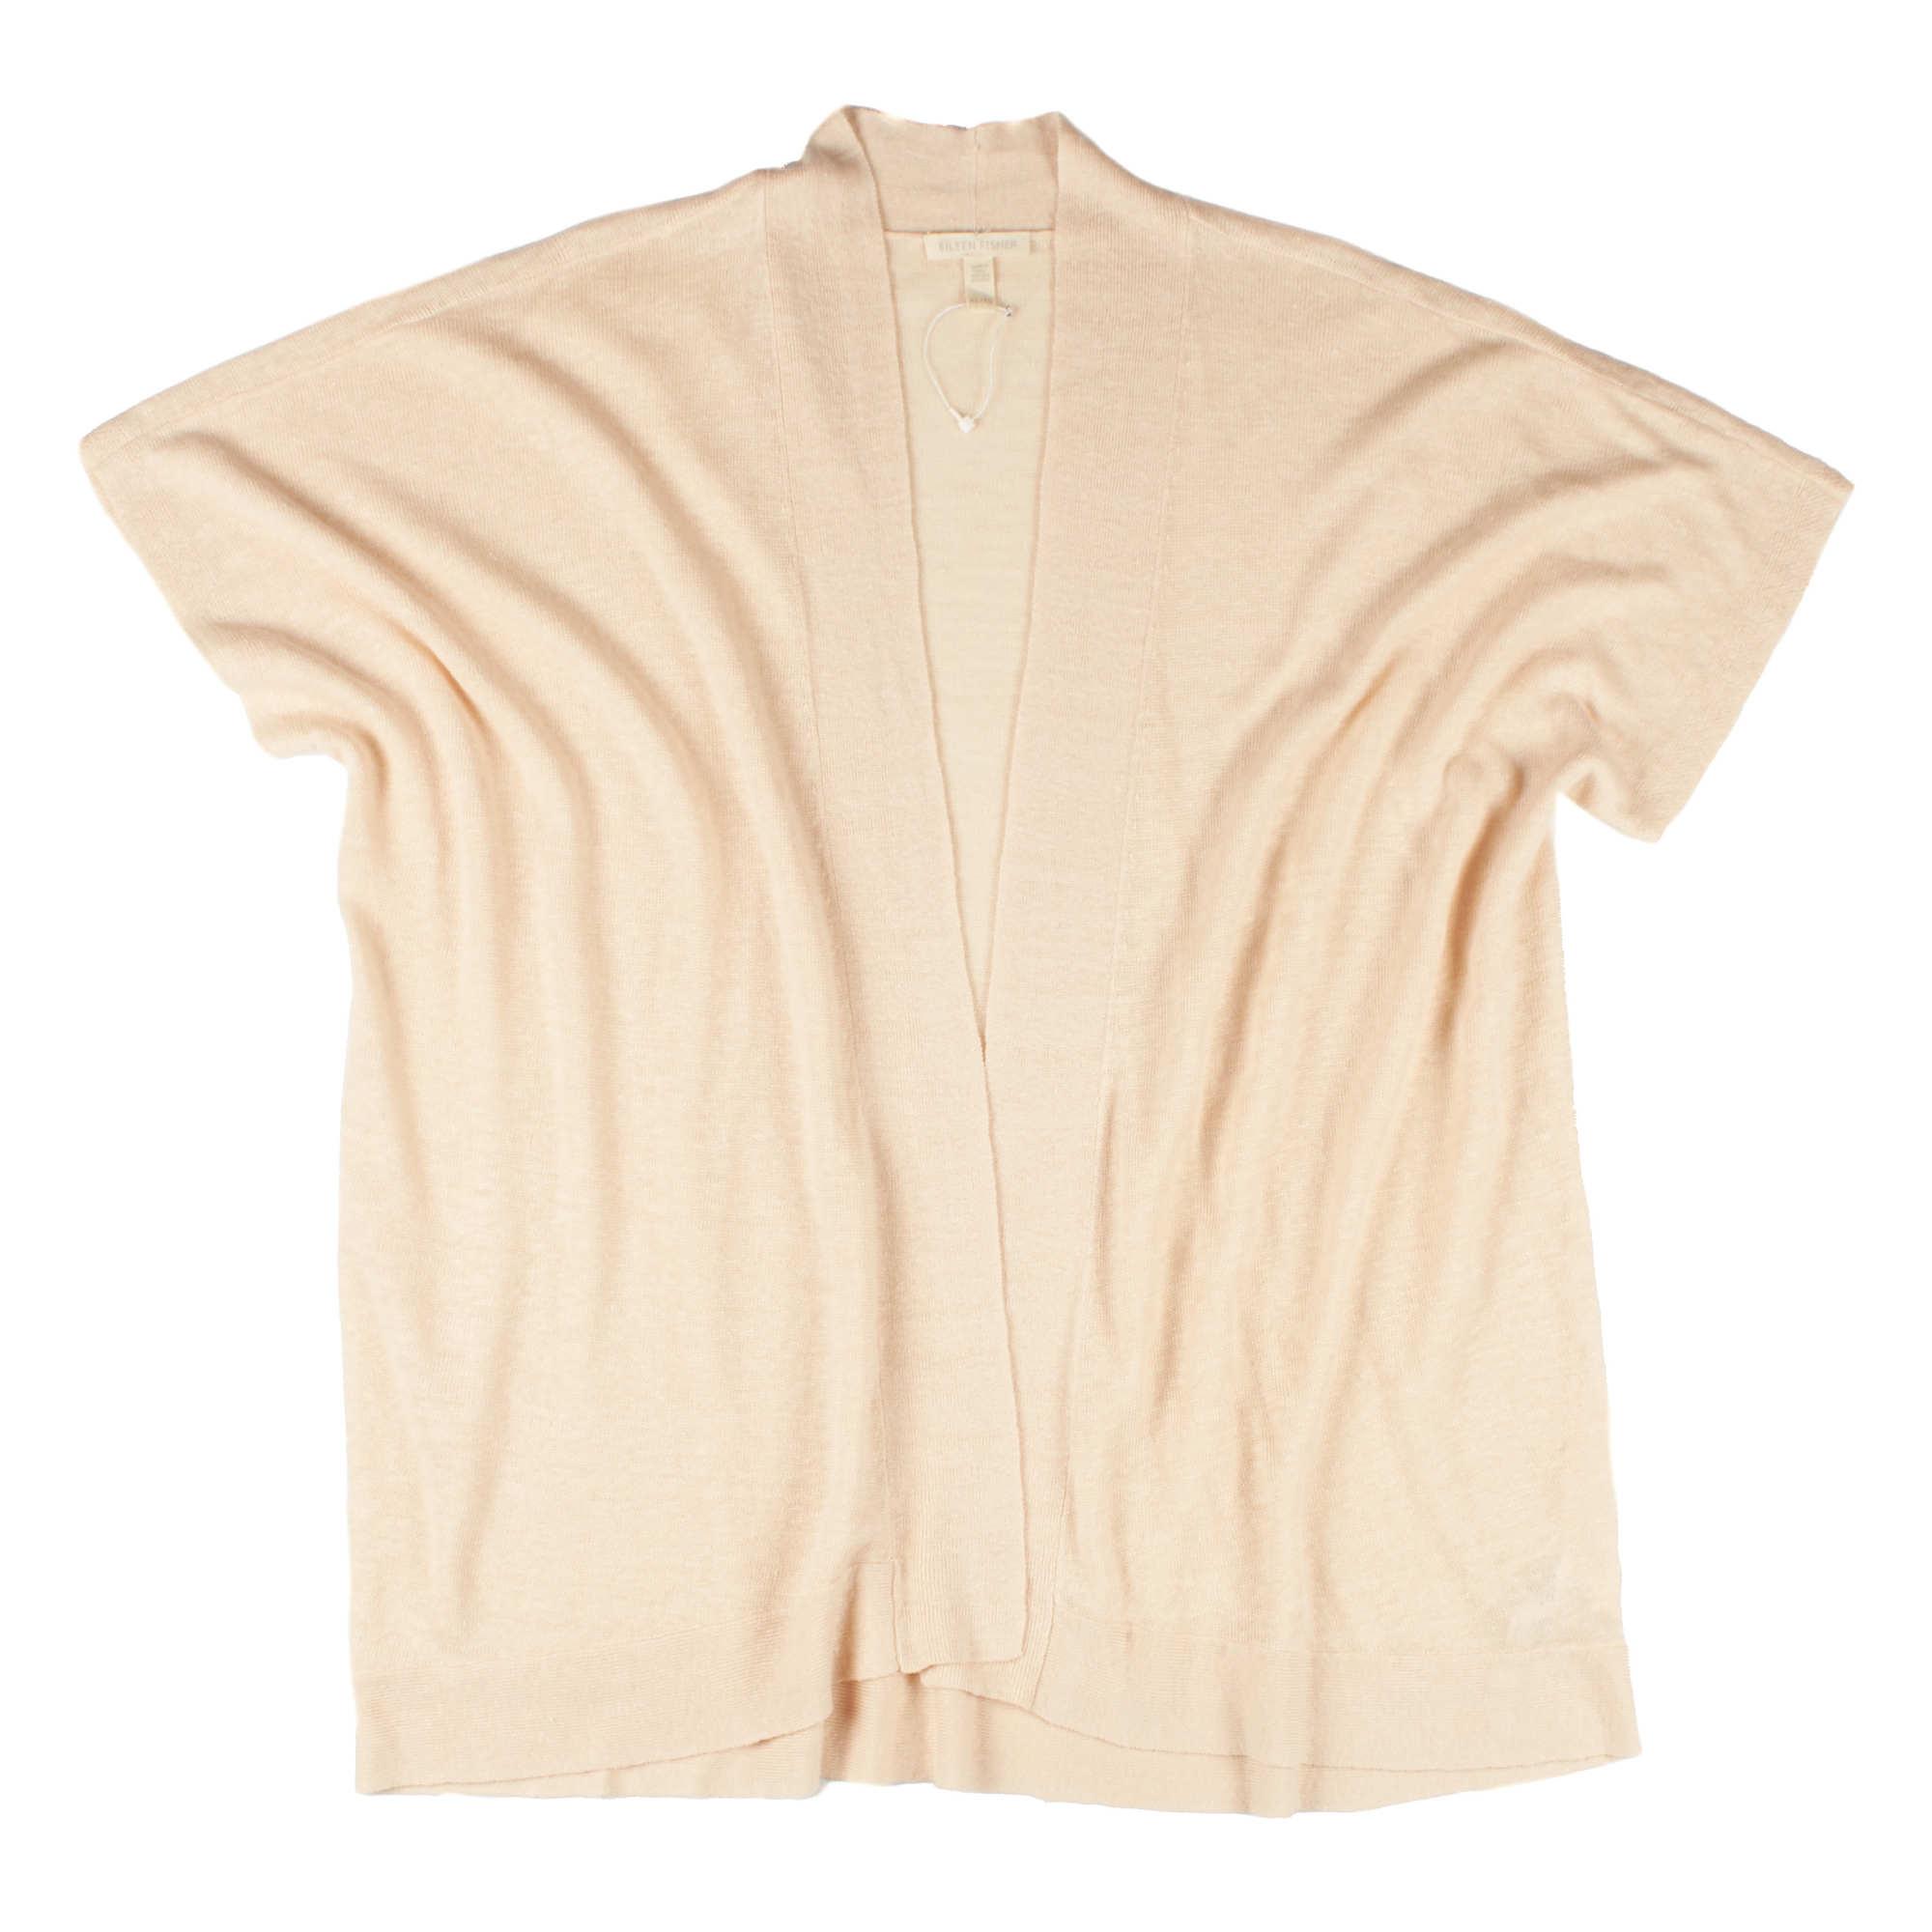 Lightweight Organic Linen Knit Cardigan